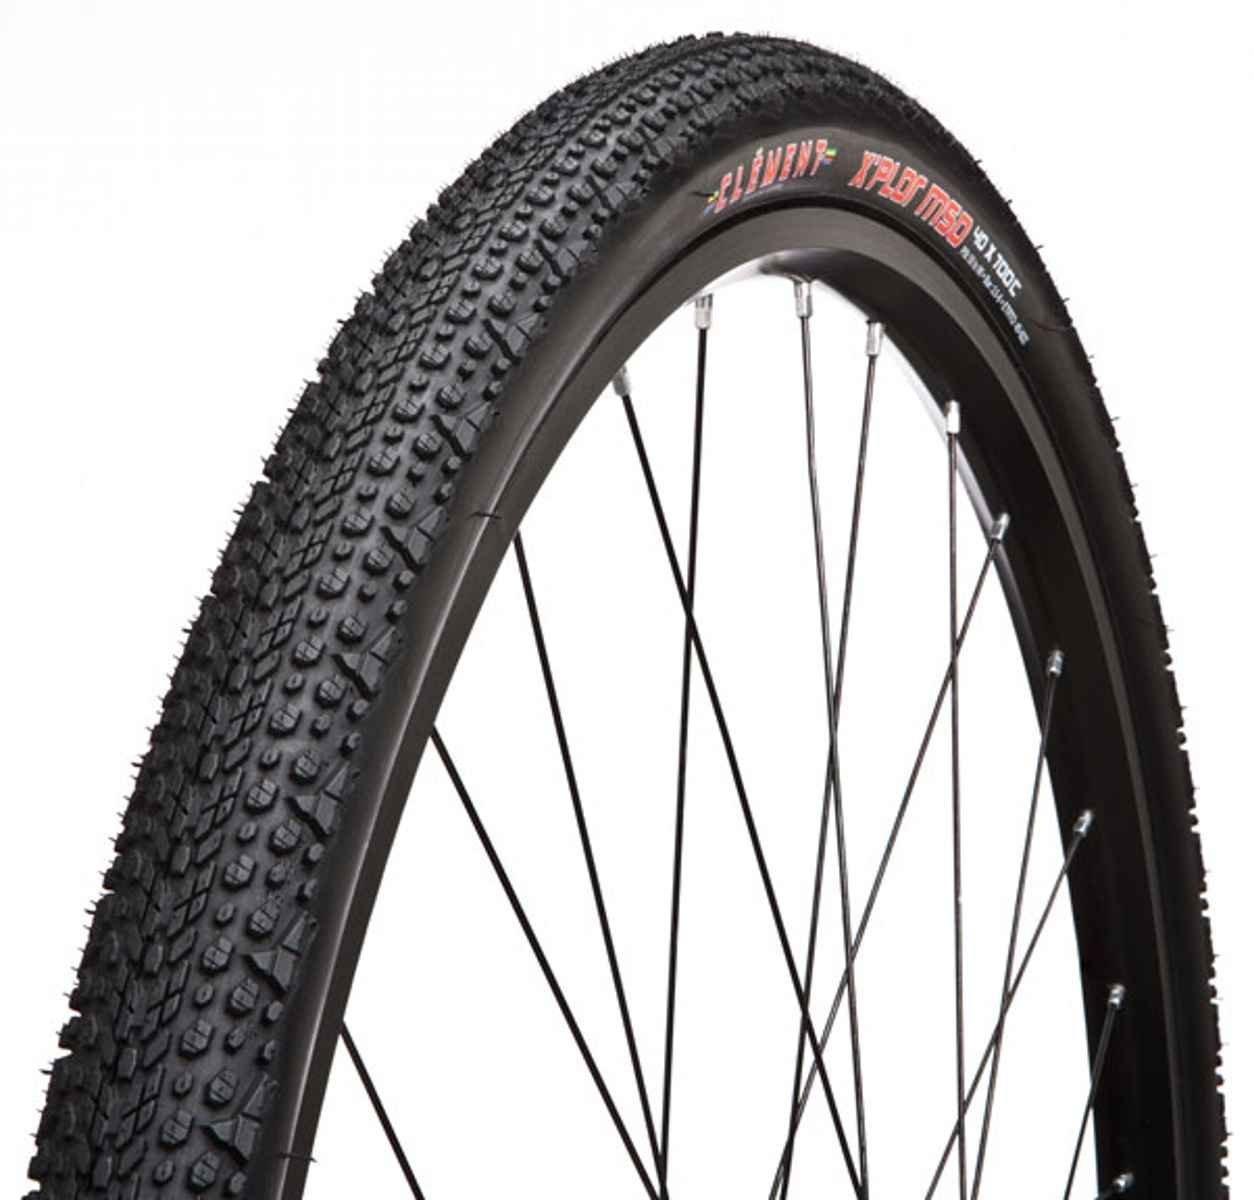 Clemens X & 039;plor-700 x 50 Fahrradreifen SC Karkasse Adventure Reifen